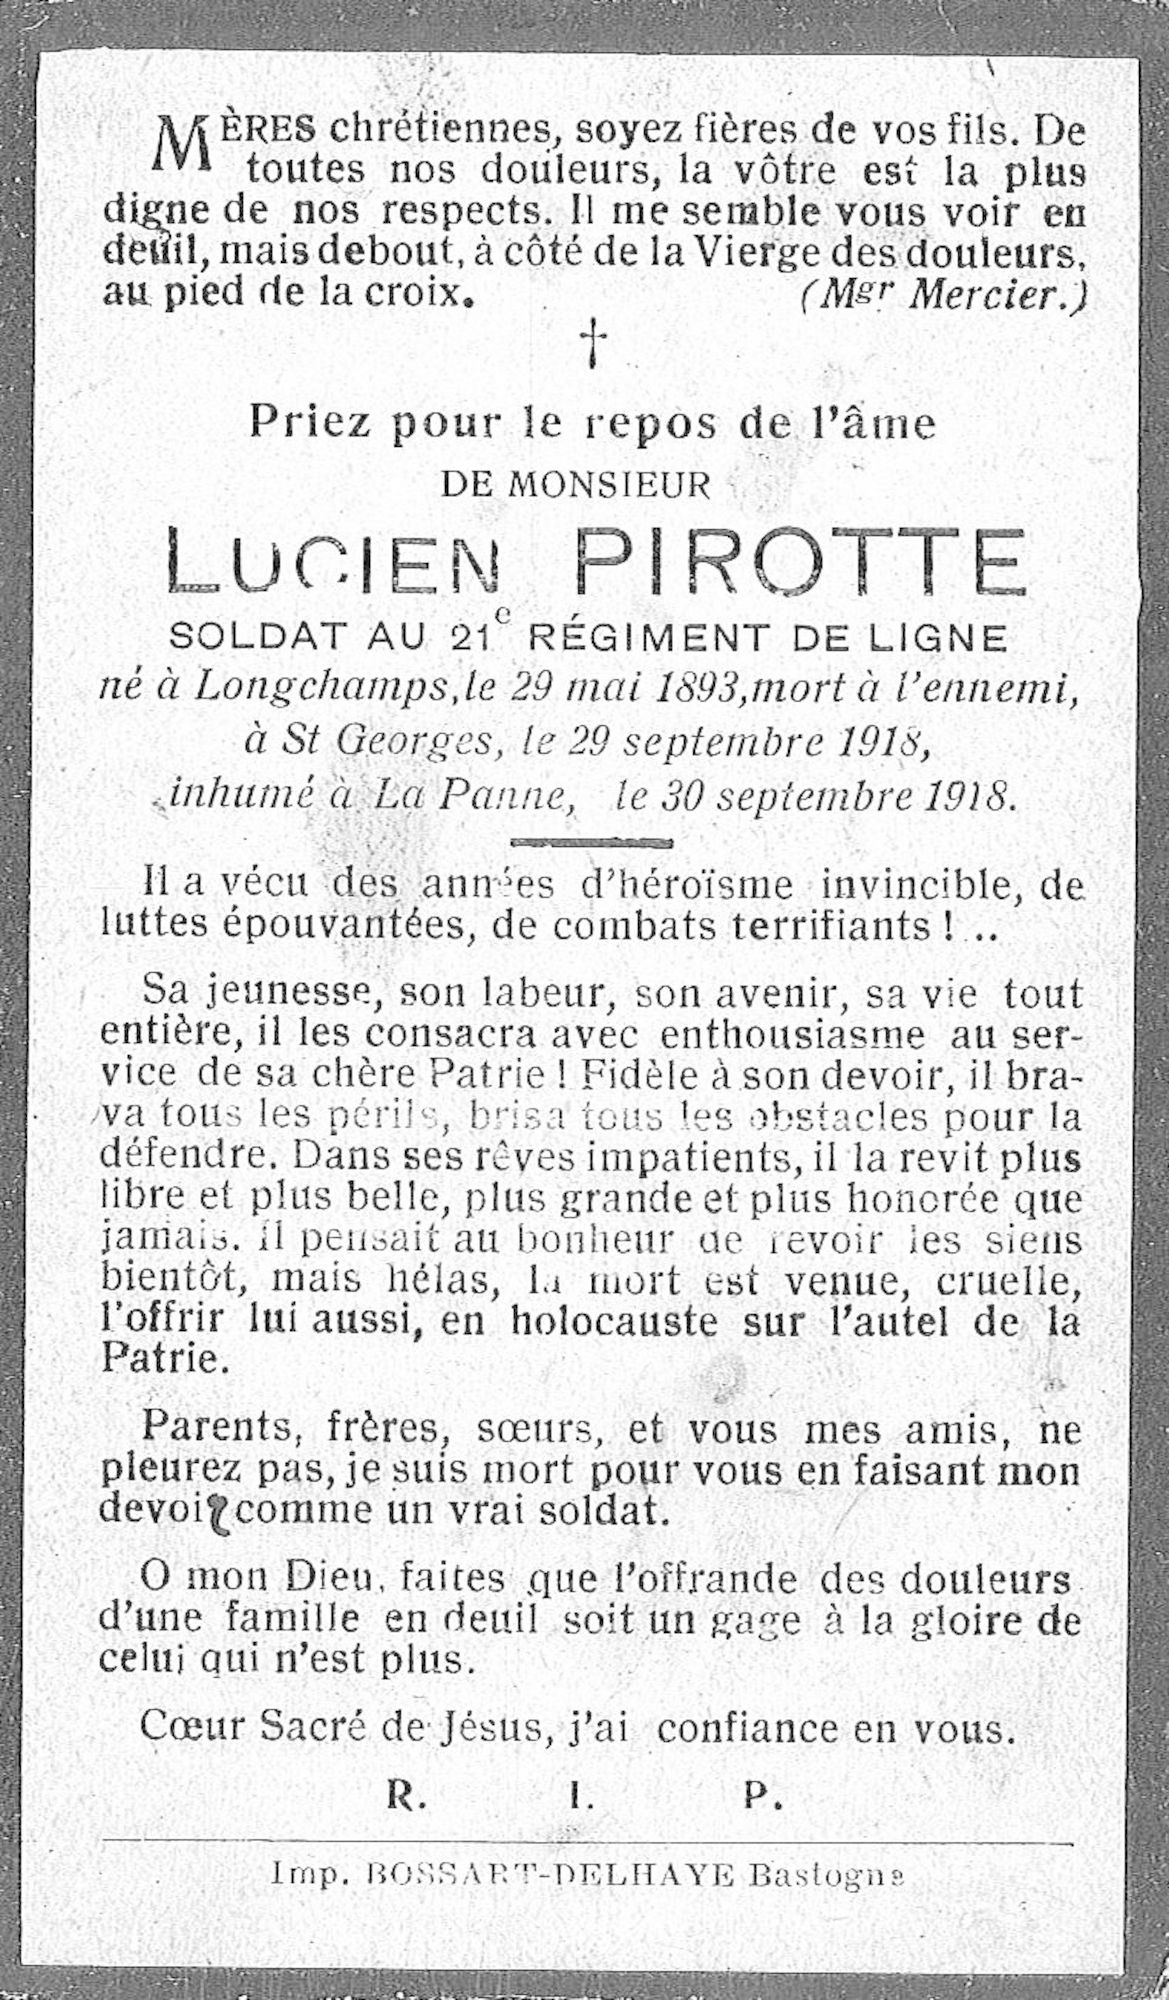 Pirotte Lucien